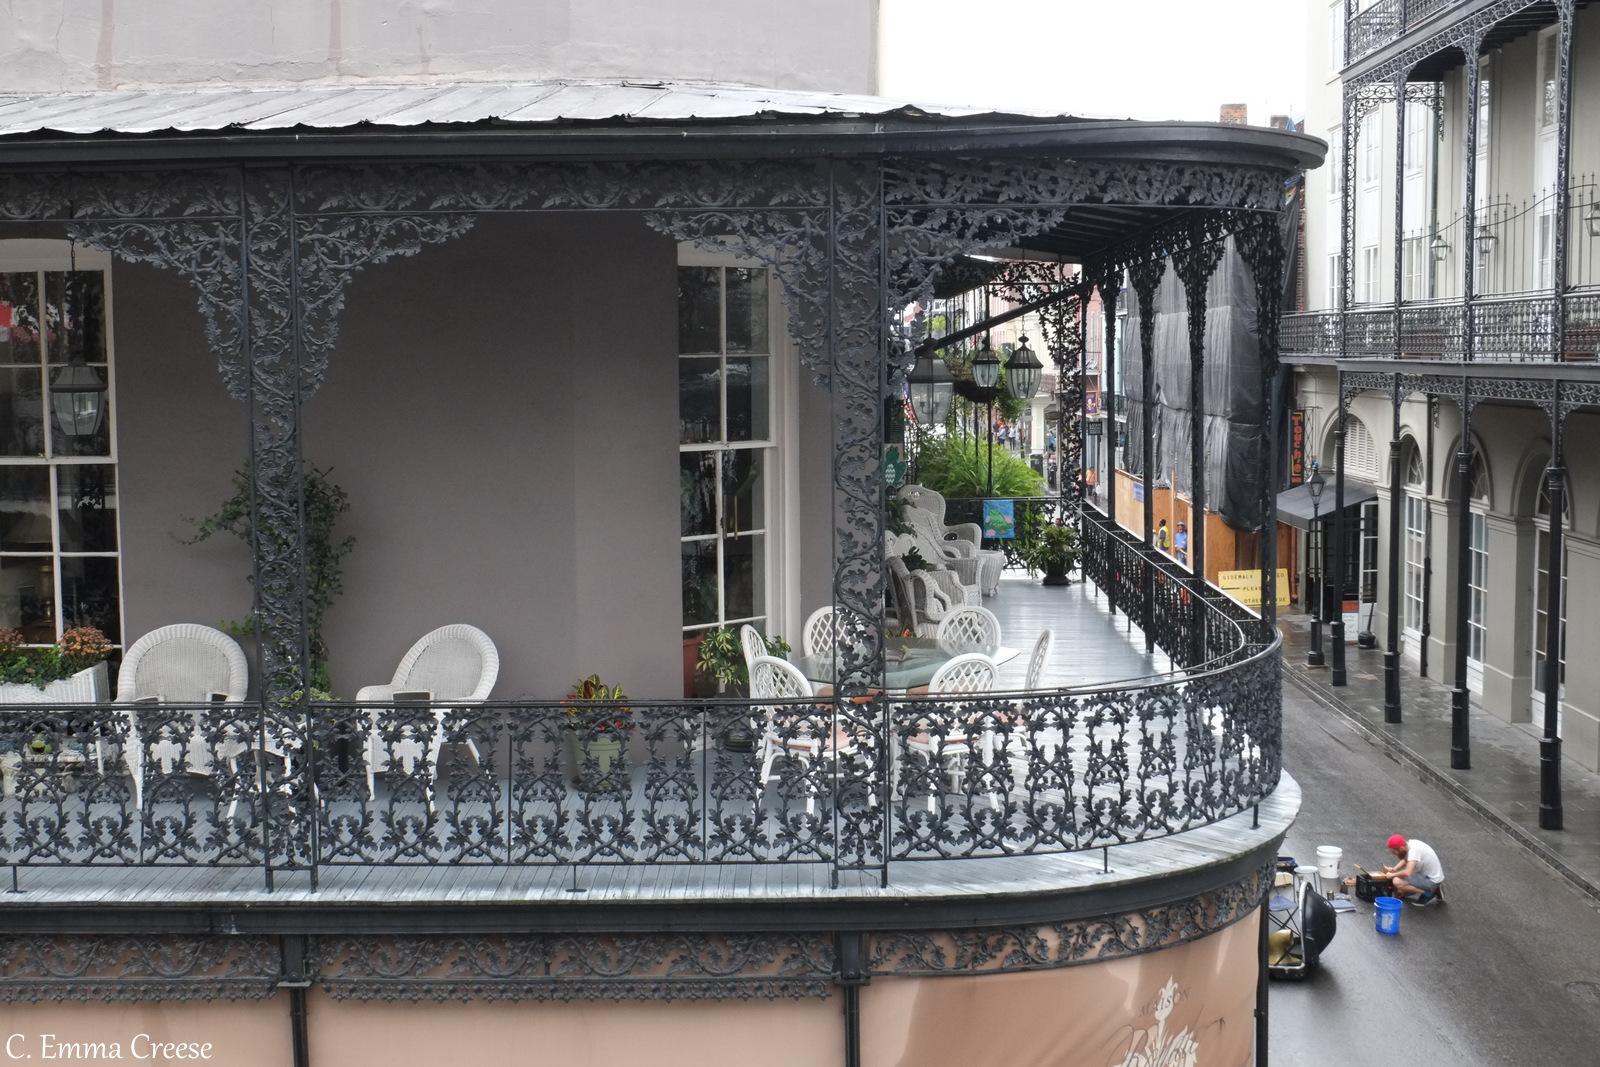 French Quarter New Orleans Louisiana Adventures of a London Kiwi